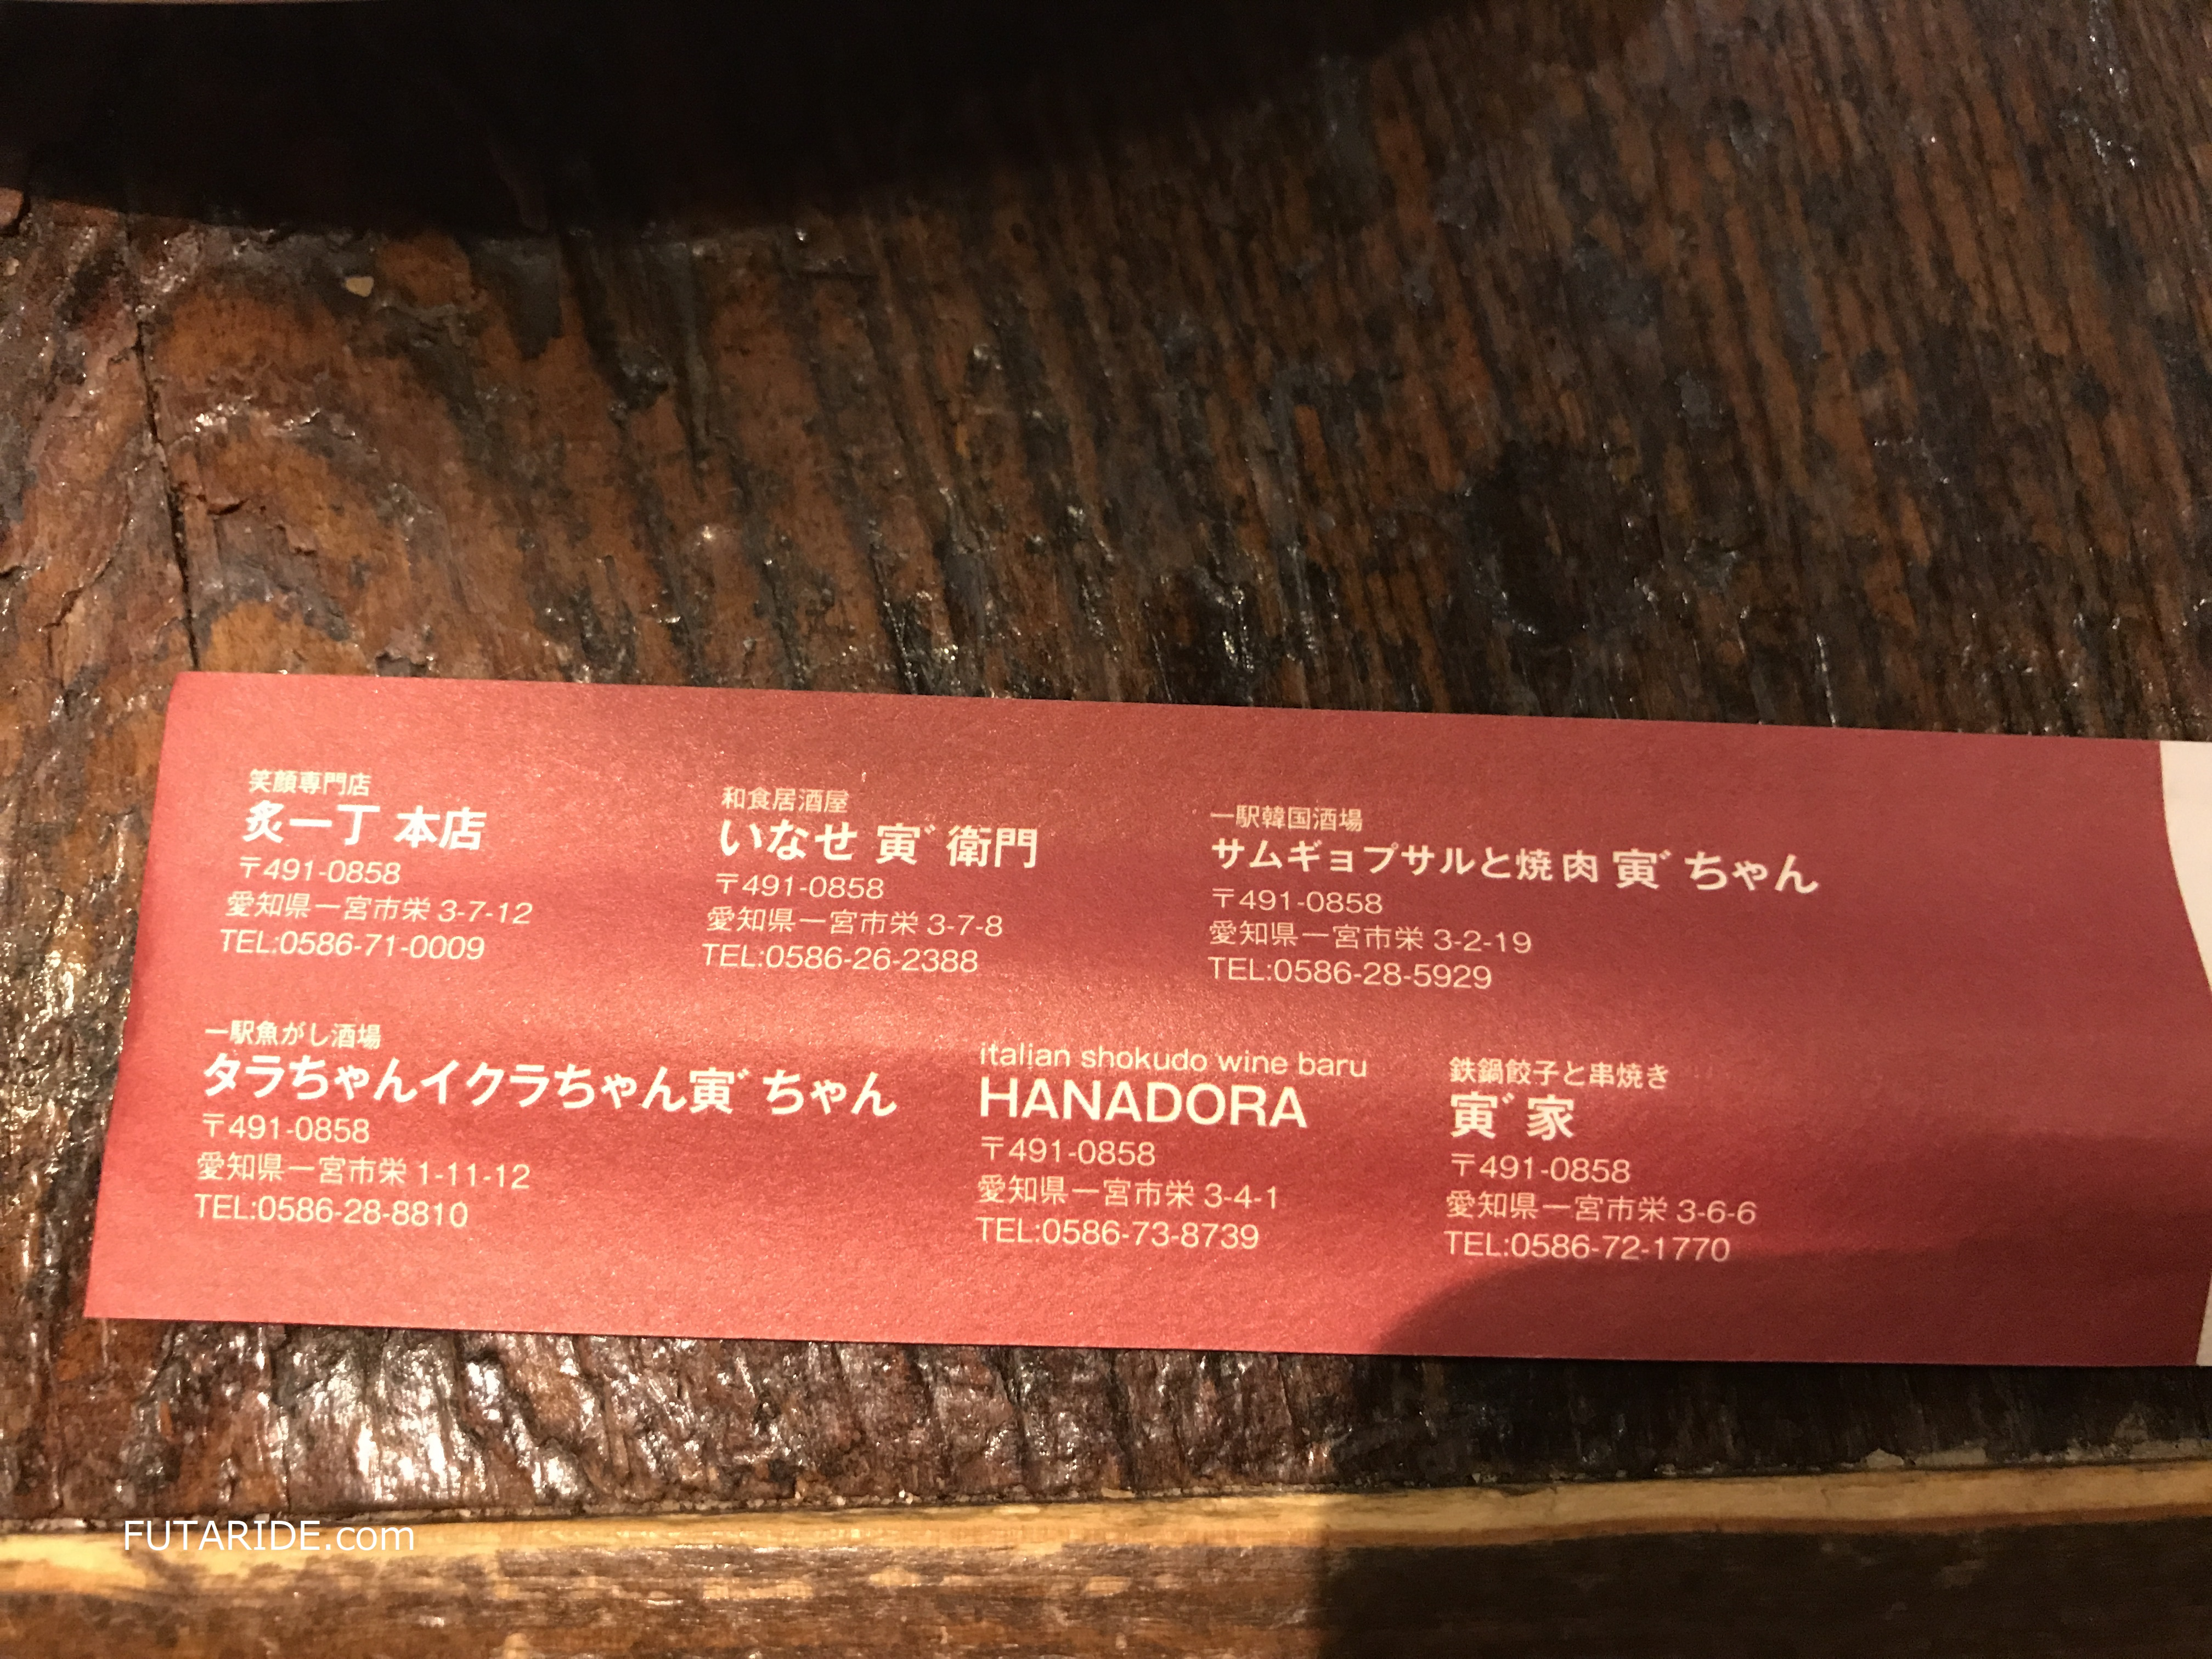 HANADORA